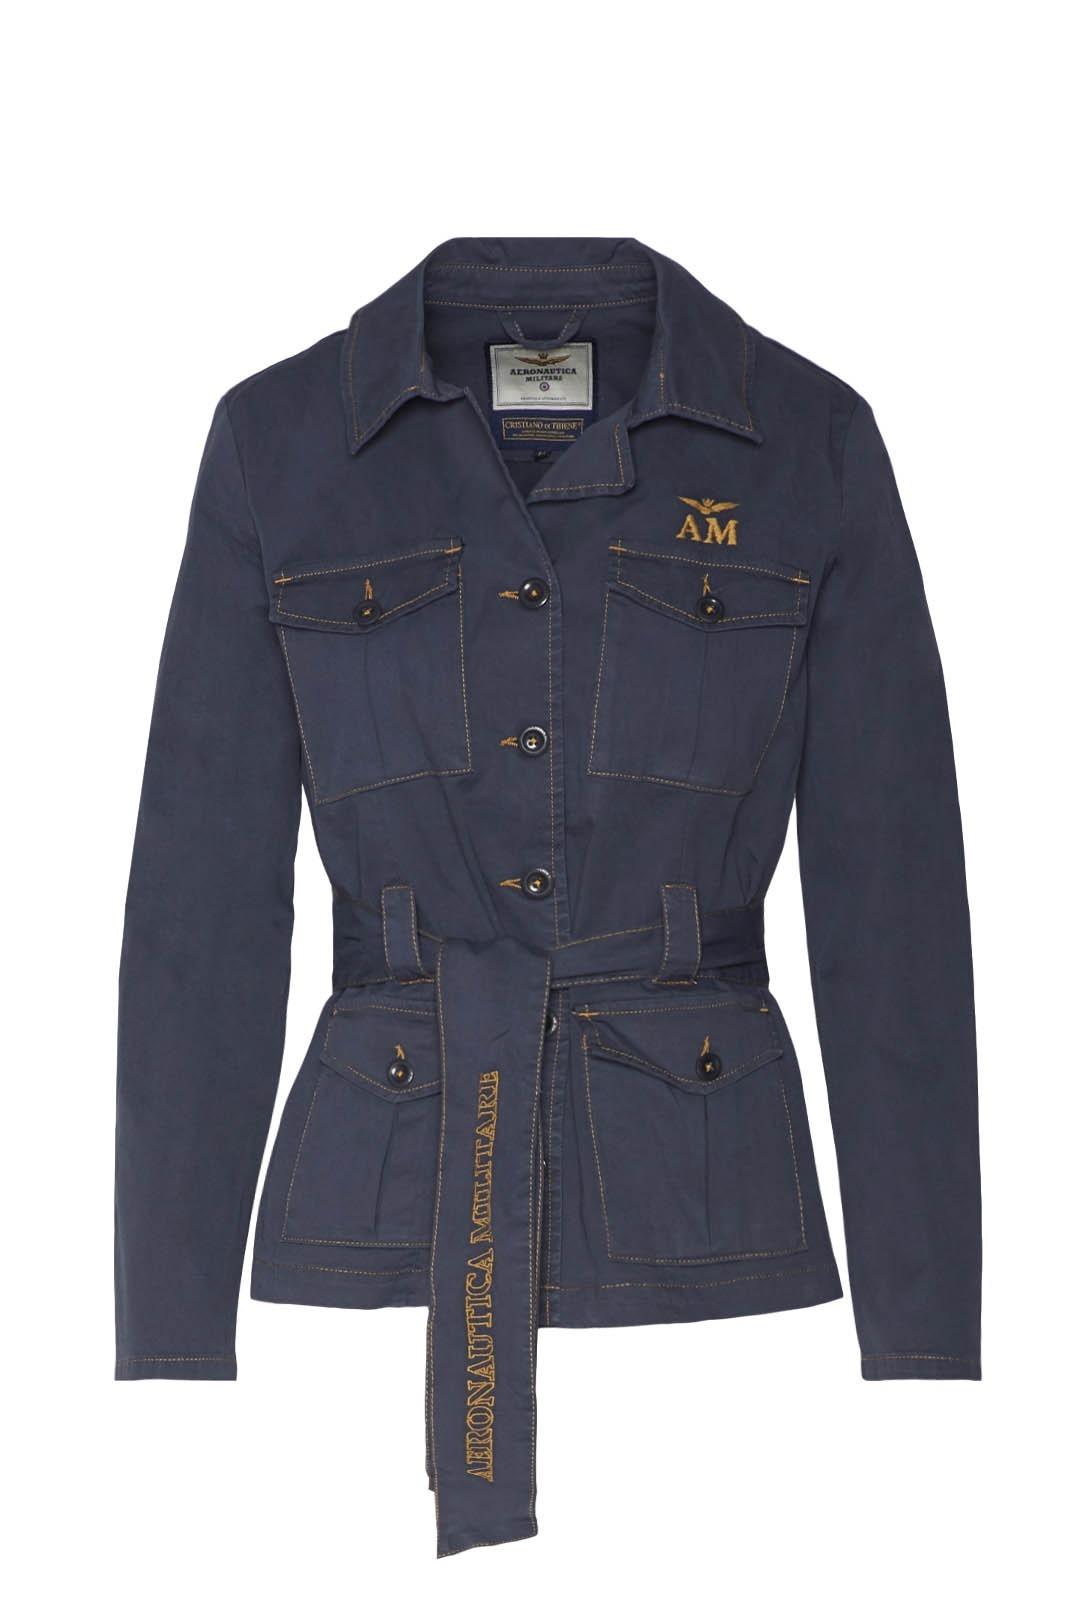 Stretch Cotton Saharan Jacket                  1